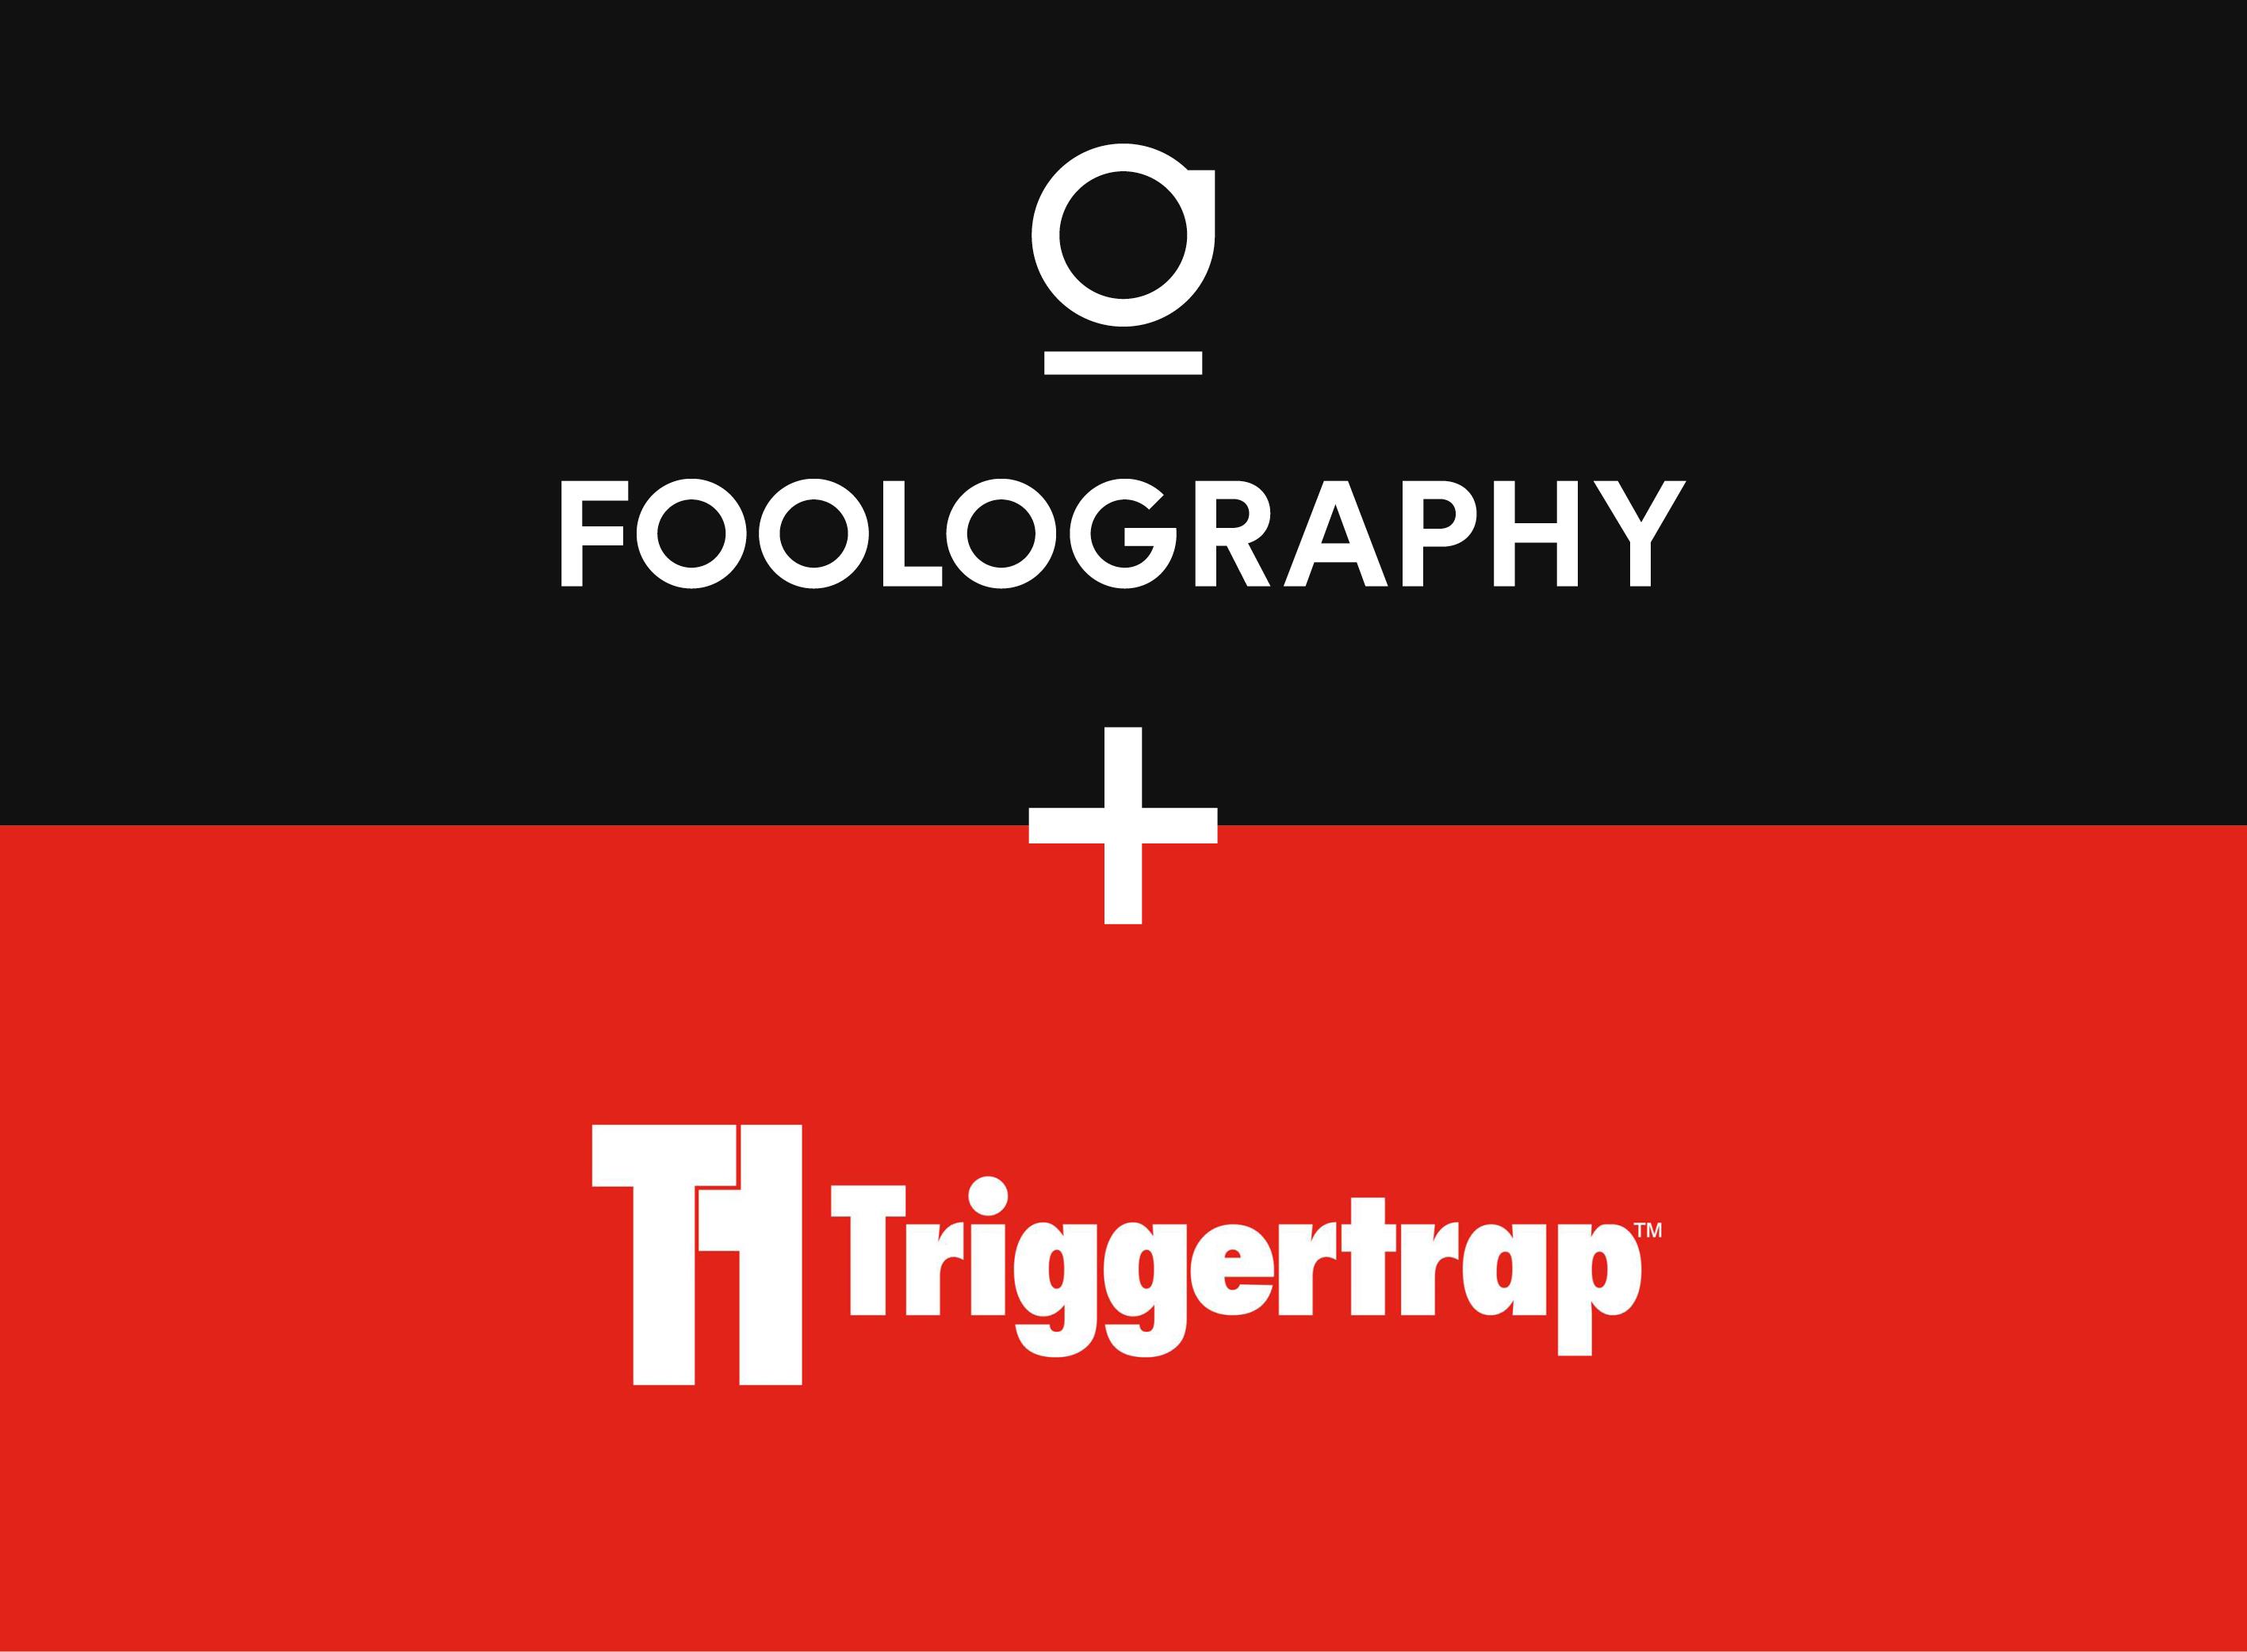 kickstarter_triggertrap_coorperation